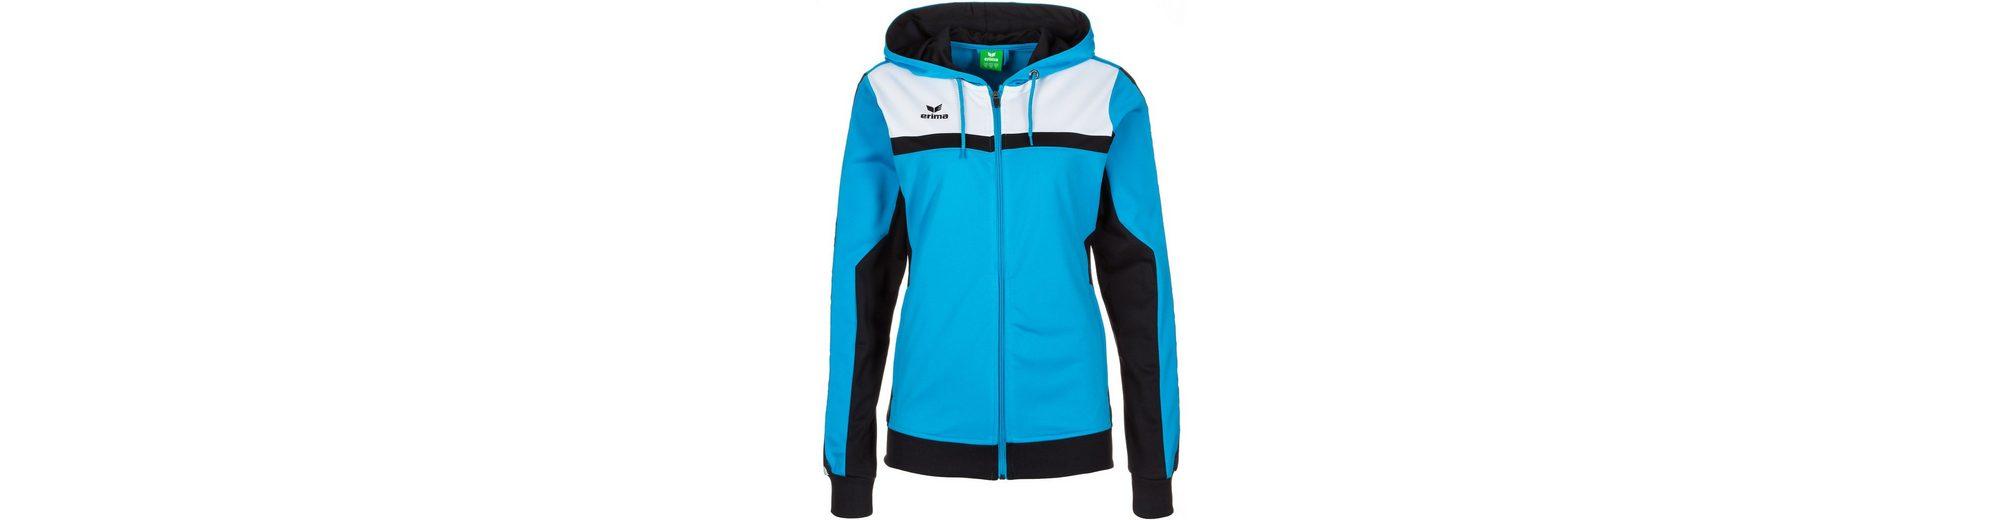 ERIMA 5-CUBES Trainingsjacke mit Kapuze Damen Low-Cost Online lO5kn8d6